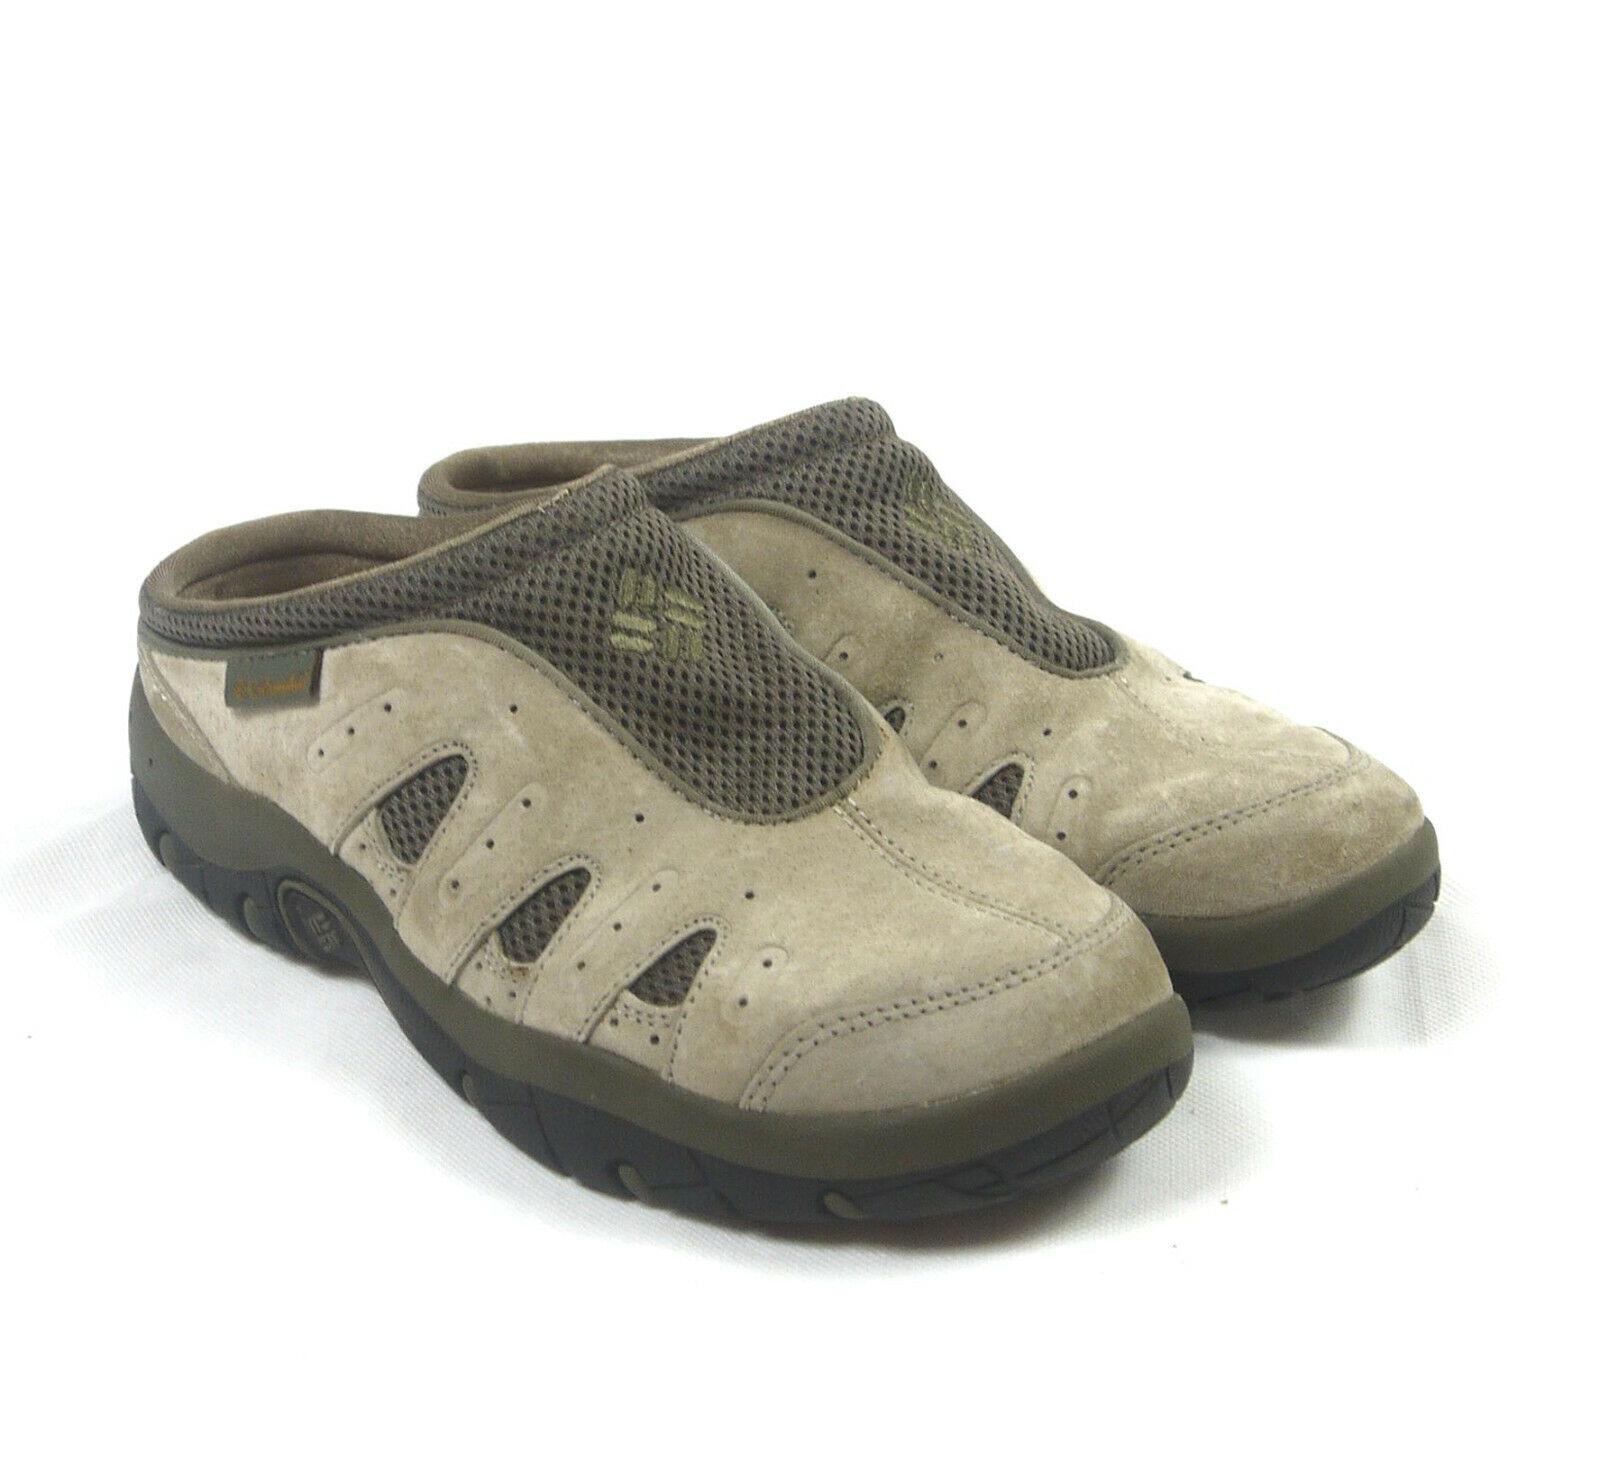 Columbia ATSA Women's Tan Suede Leather Clogs Size 8.5